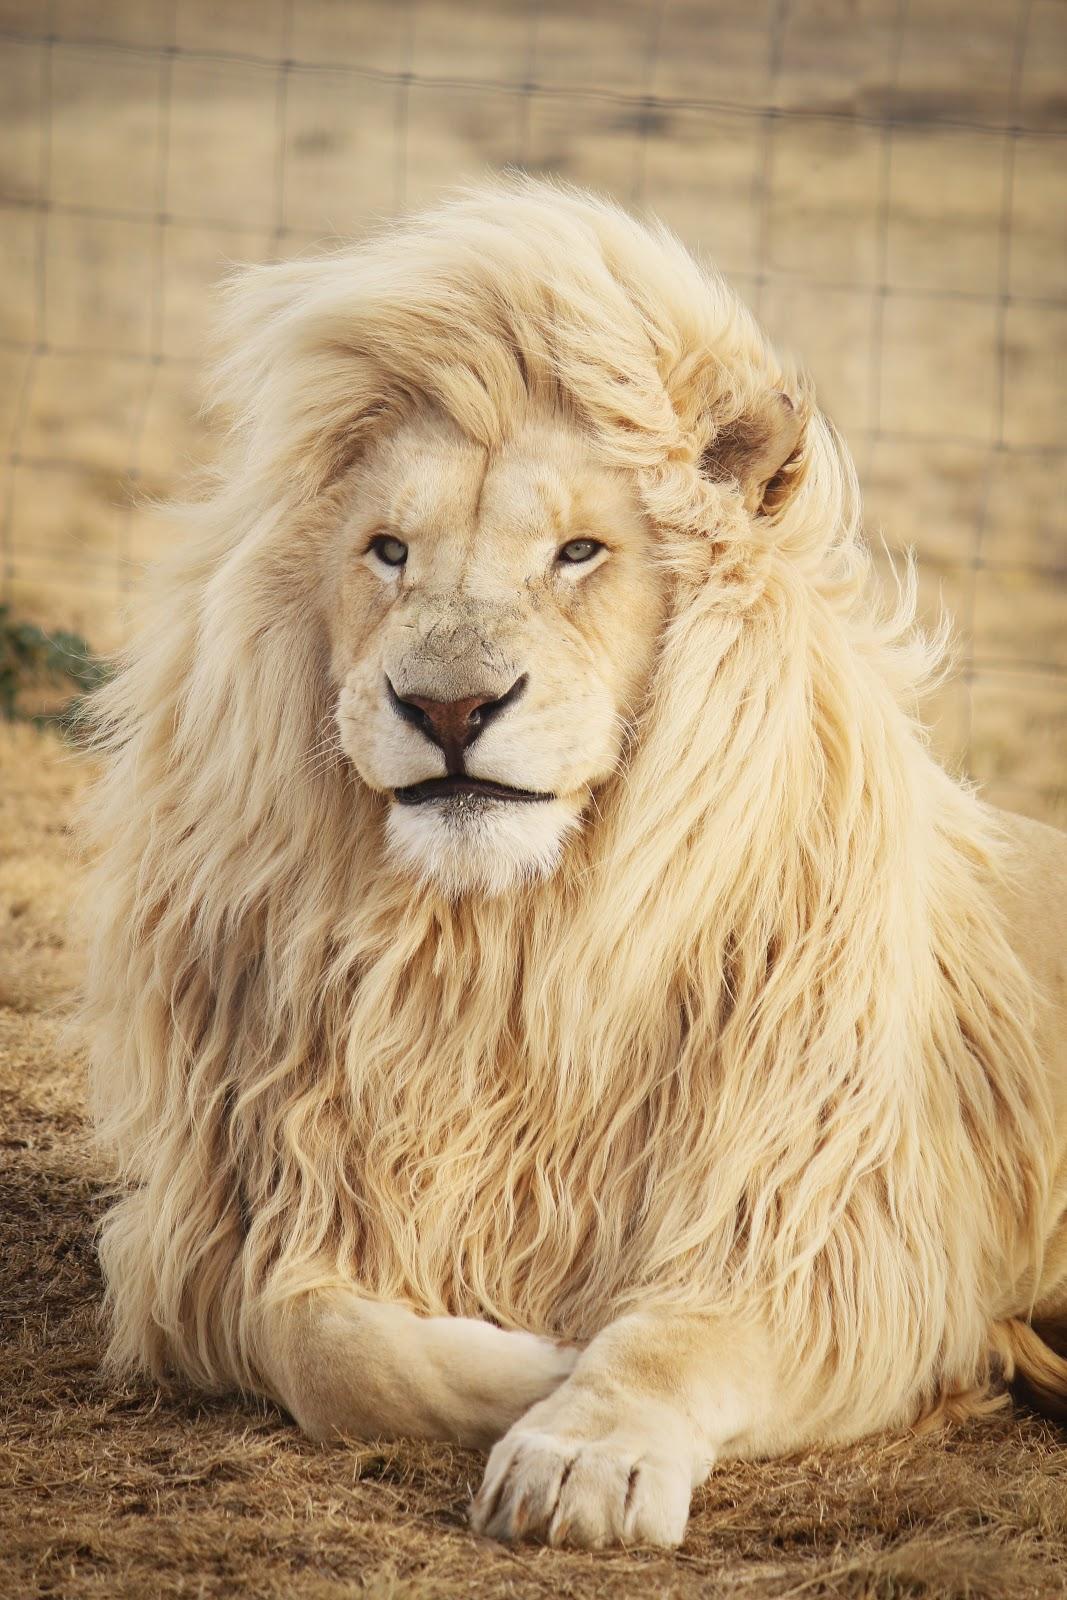 Lion portrait with mellow, yellow tones